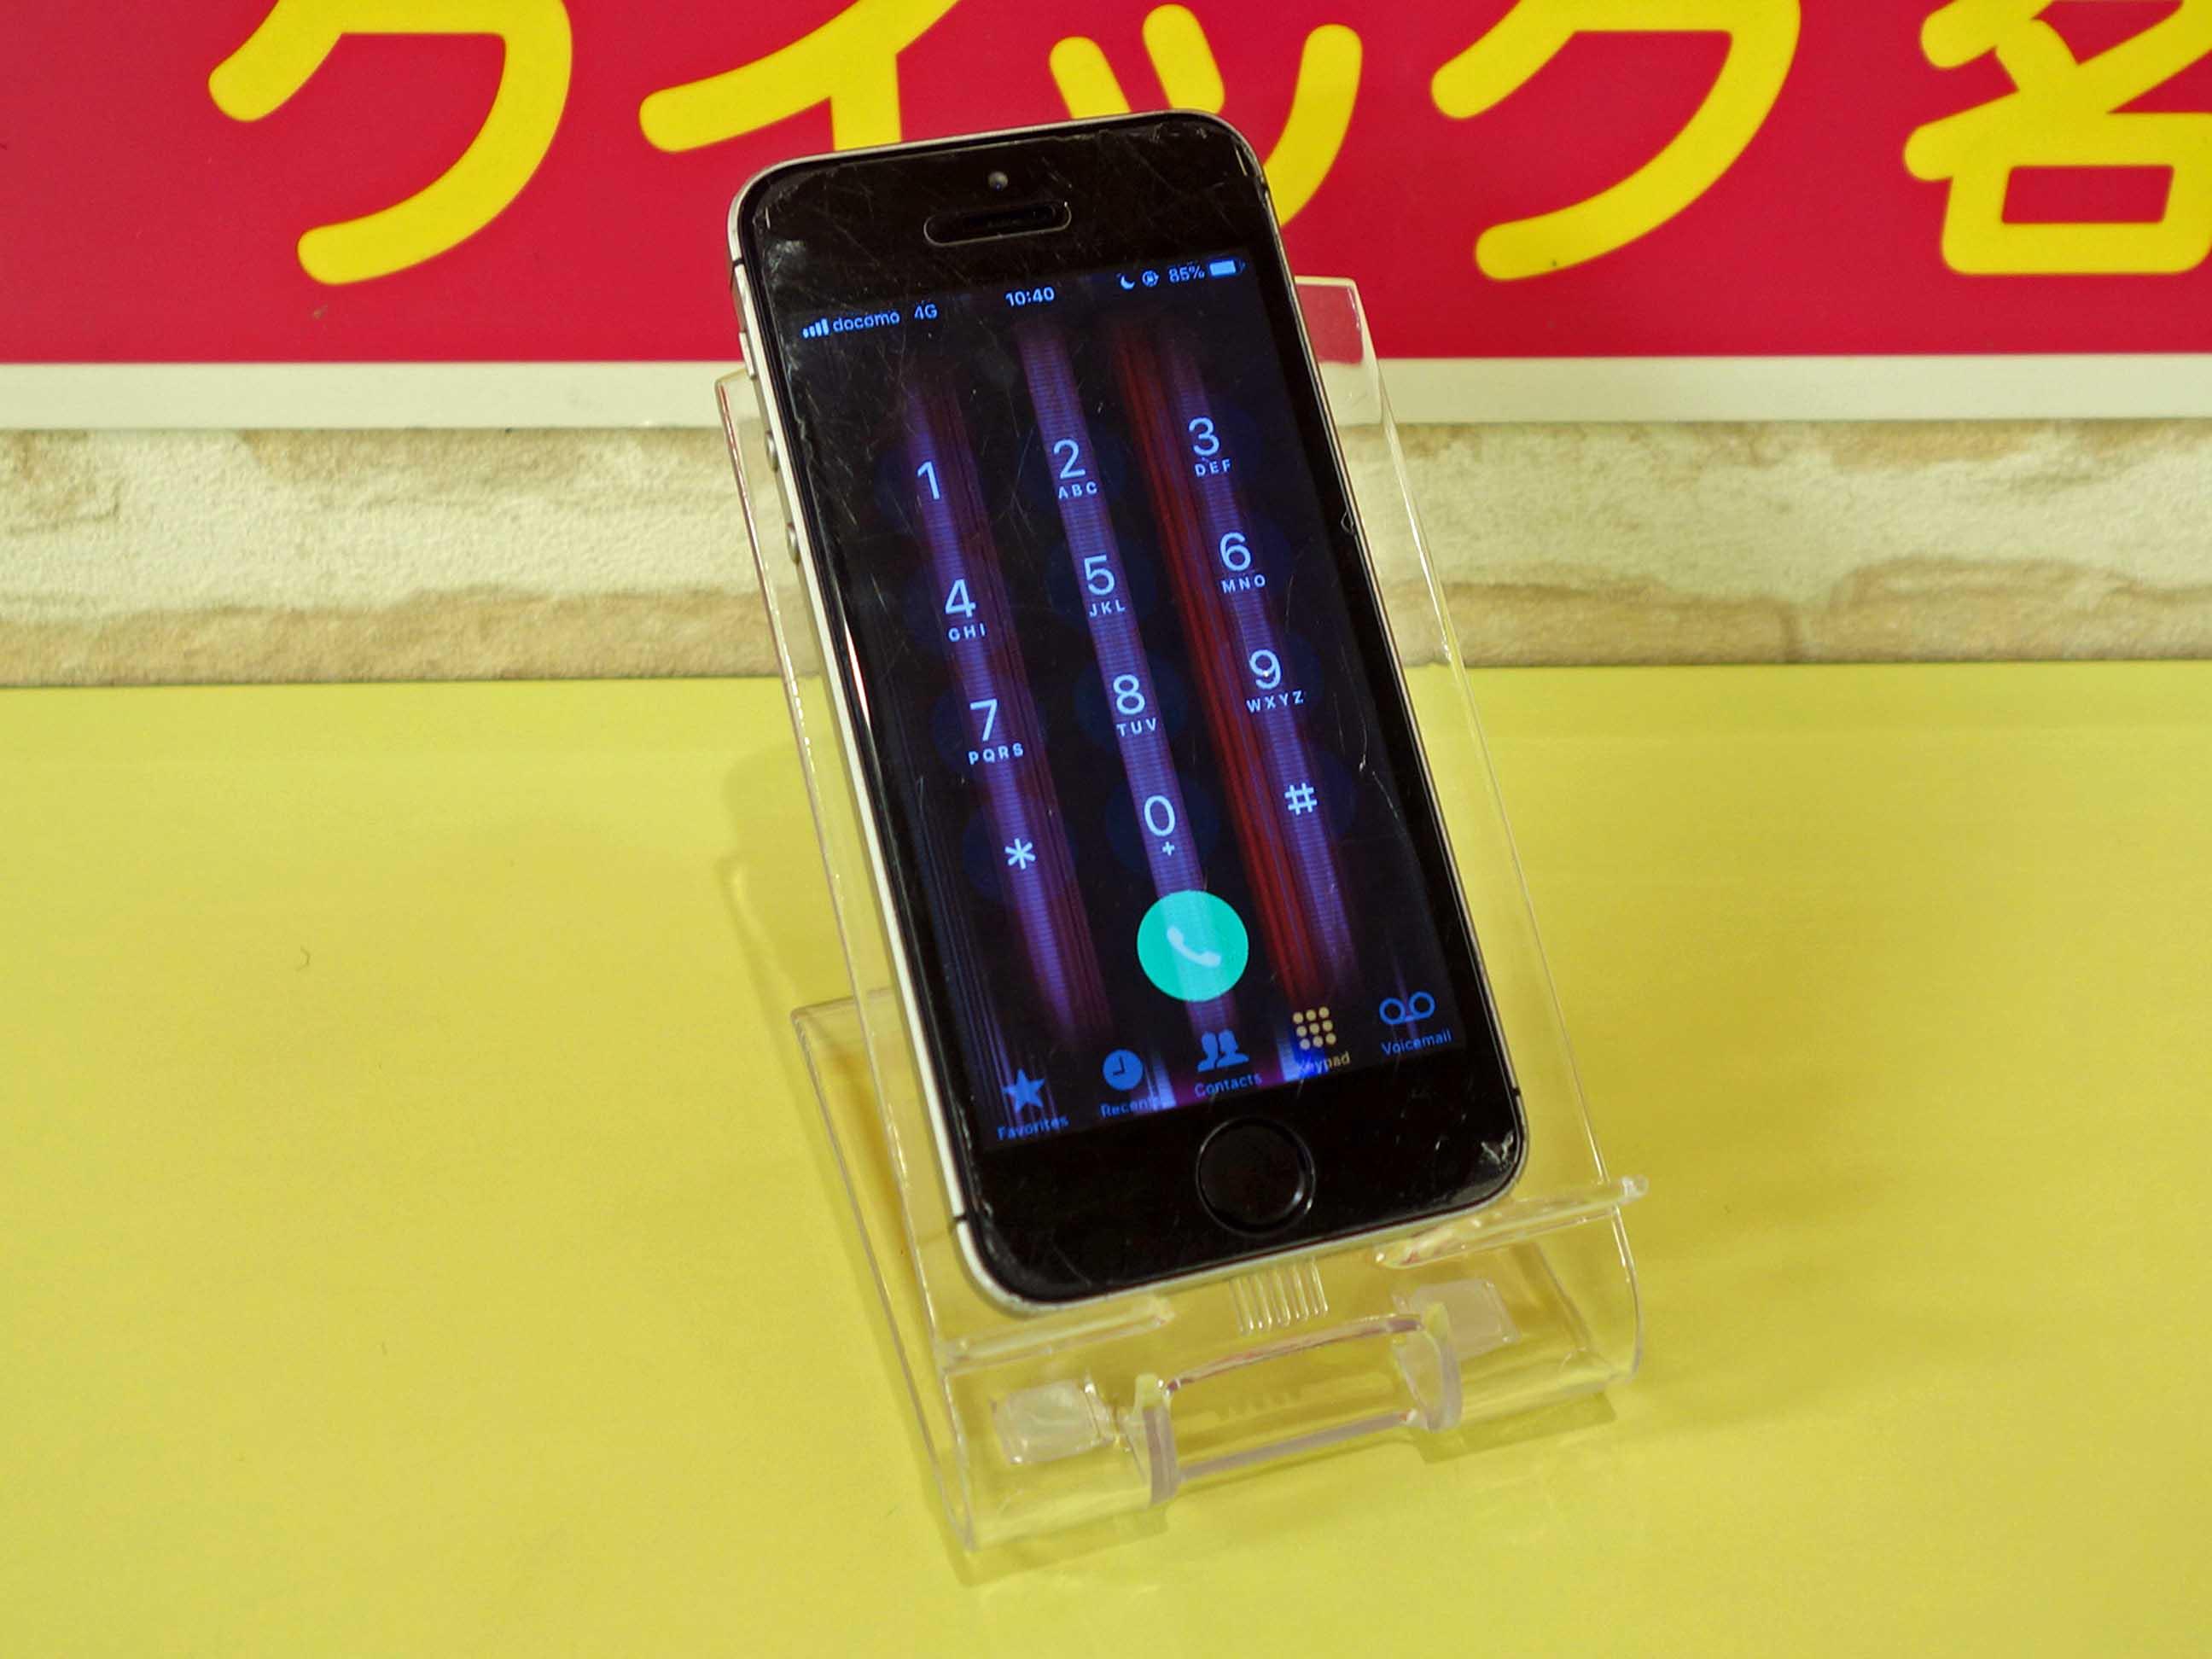 iPhoneSE 水没修理に名古屋市内よりご来店!アイフォン修理のクイック名古屋